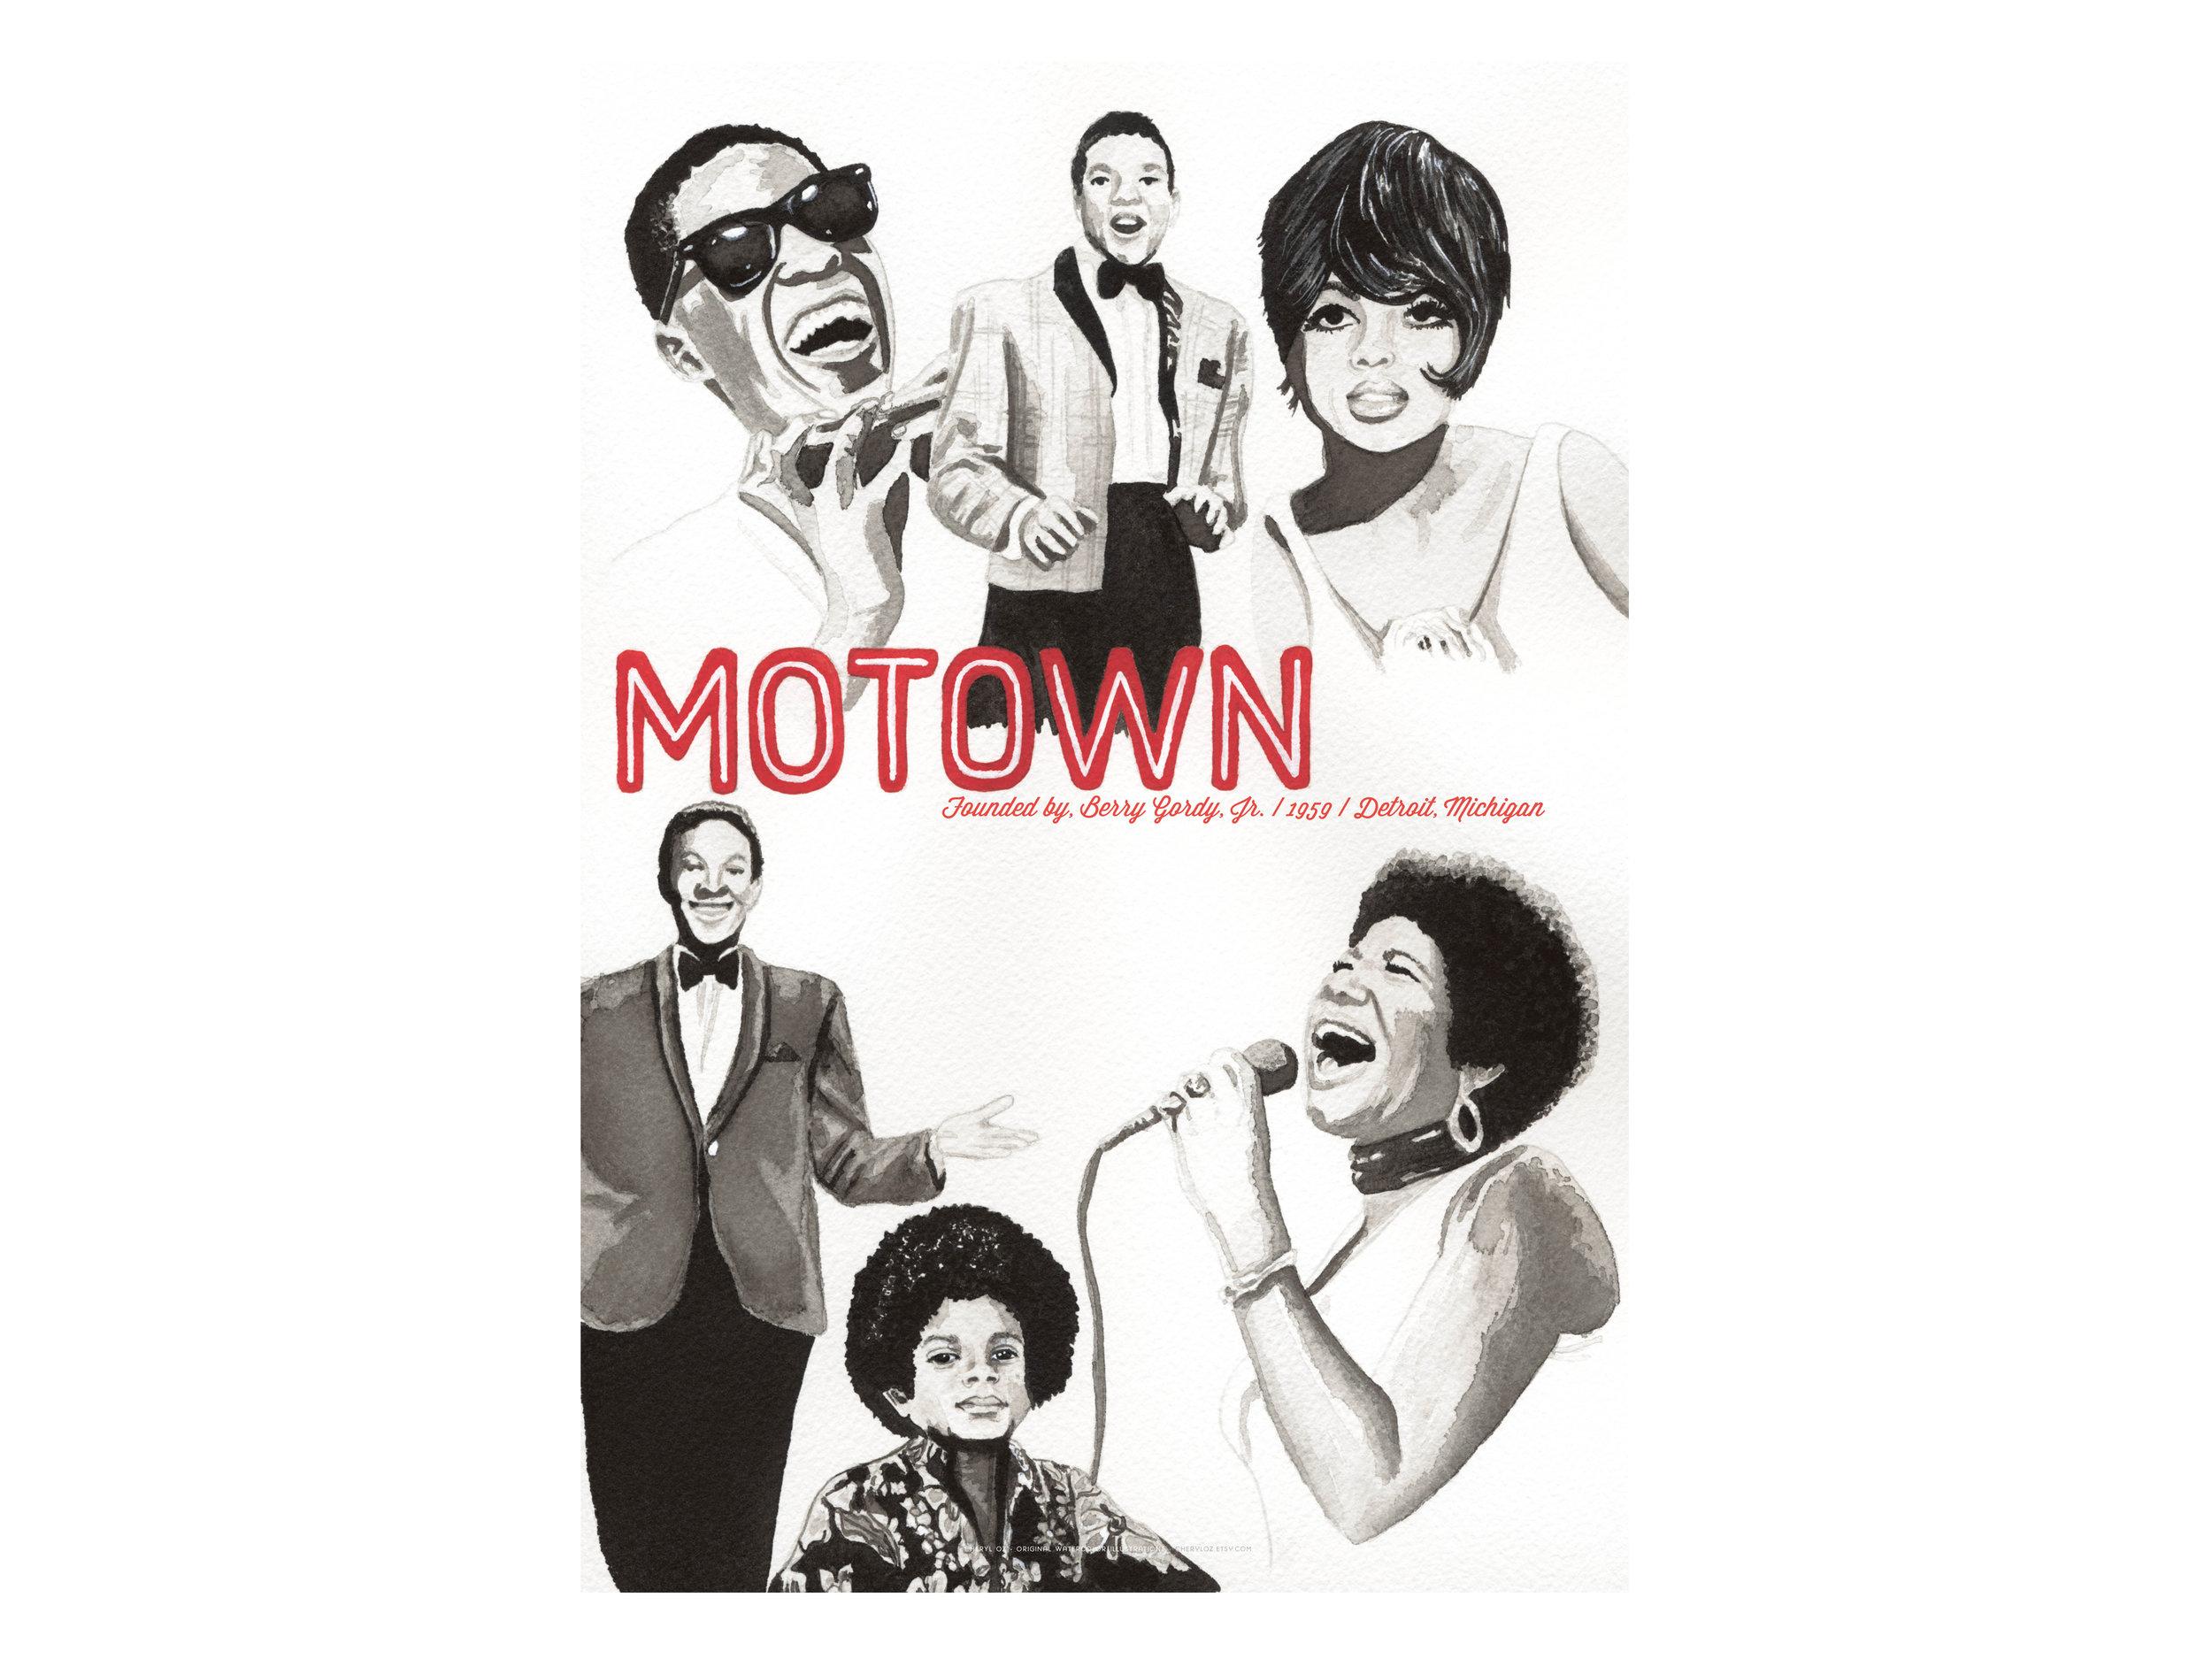 Motown Poster Design